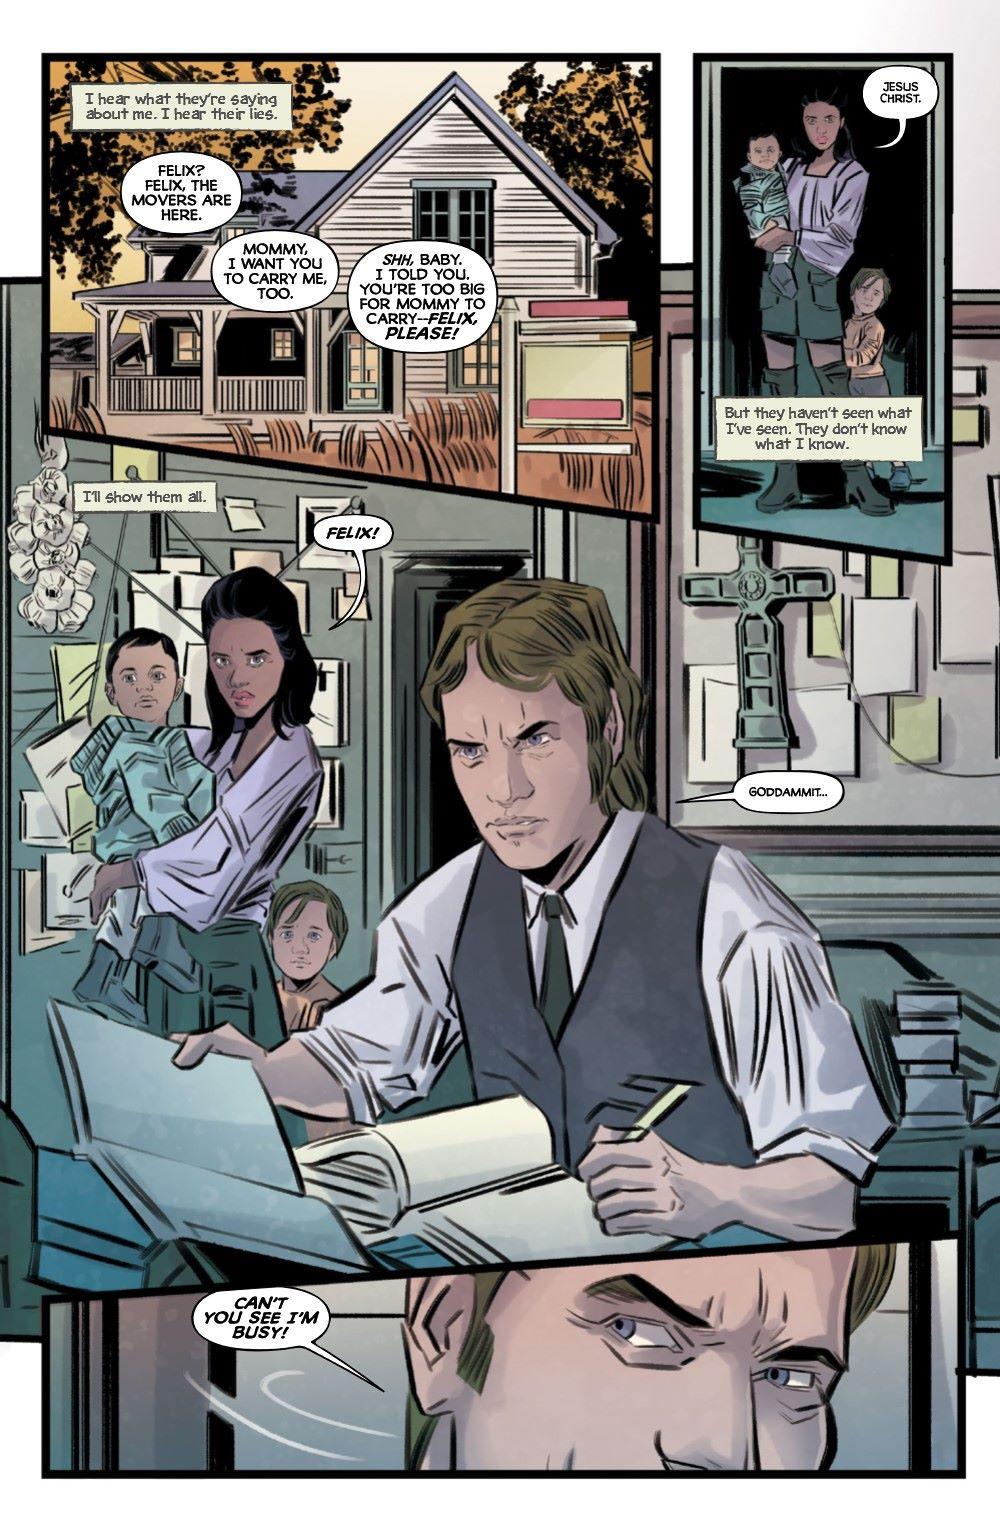 VAIN-4-MARKETING-04 ComicList Previews: THE VAIN #4